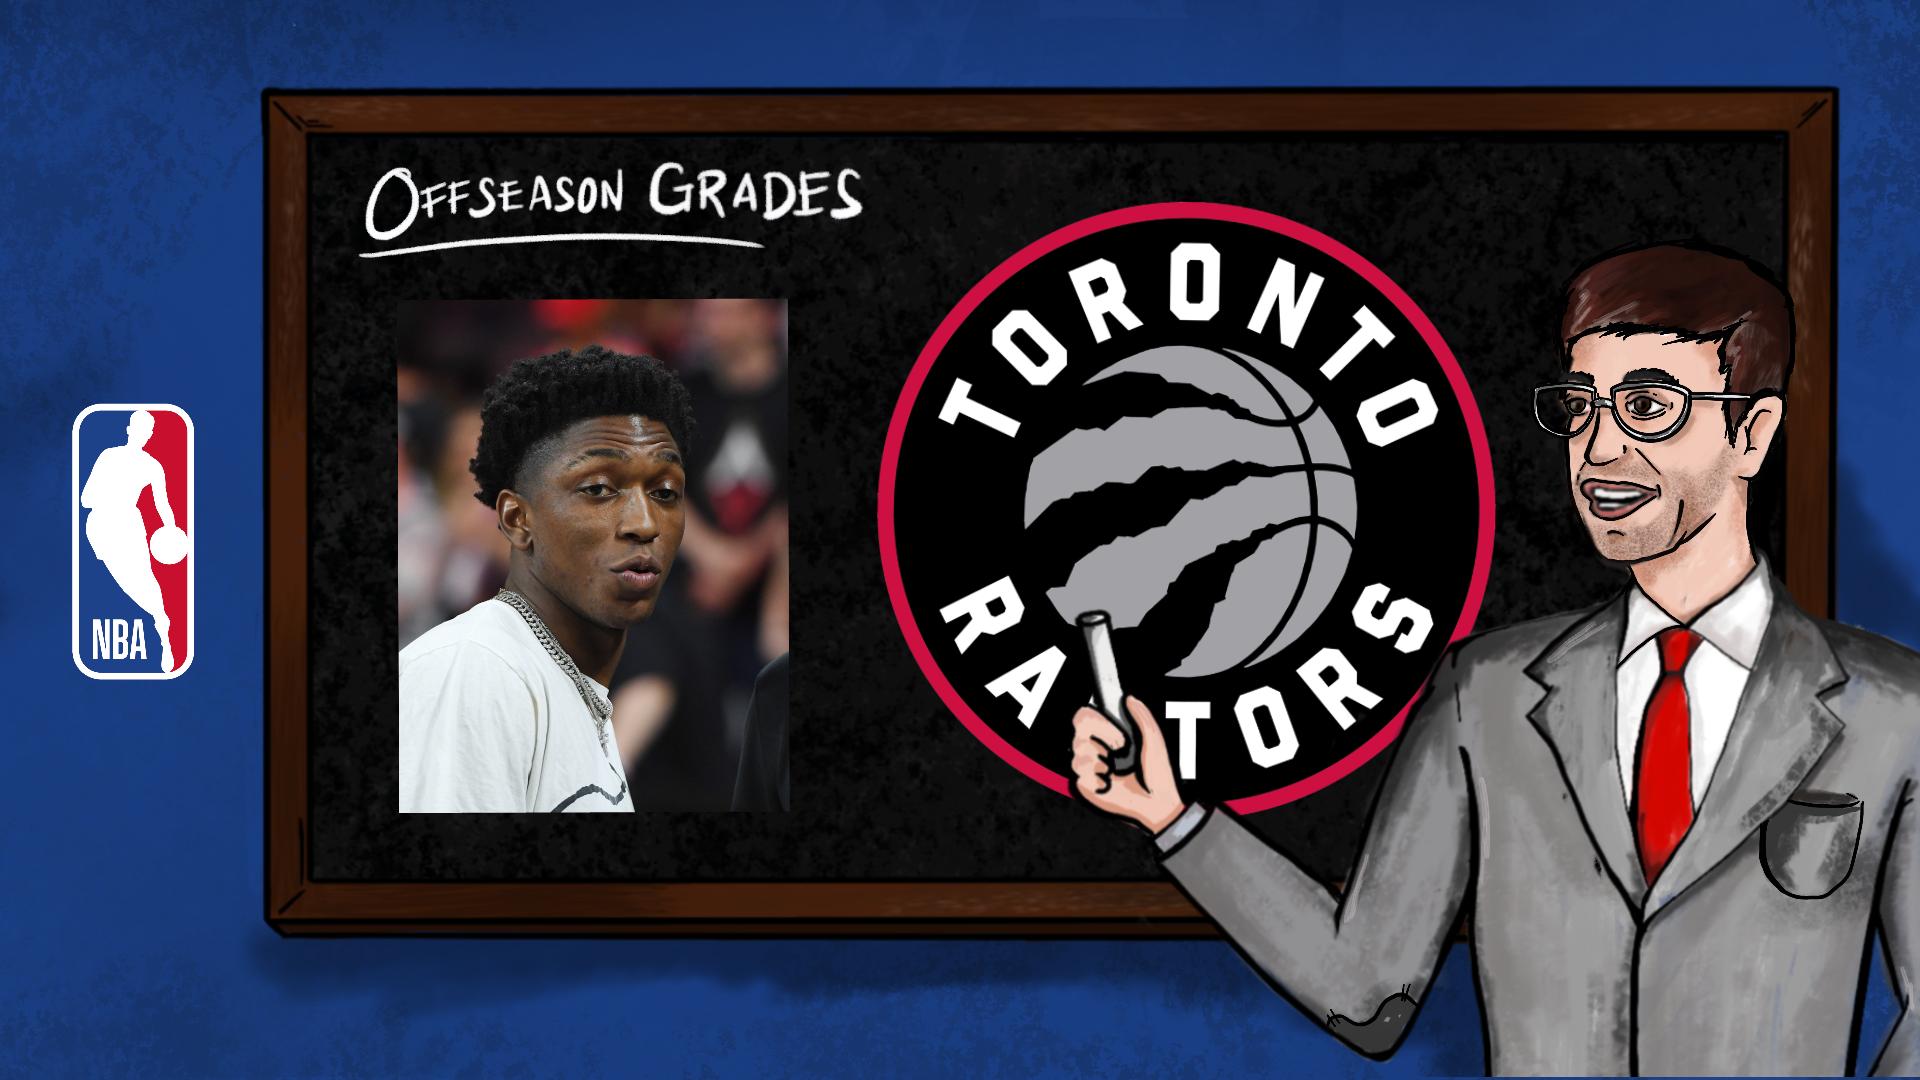 Offseason Grades: How did the Toronto Raptors do in replacing Kawhi Leonard?